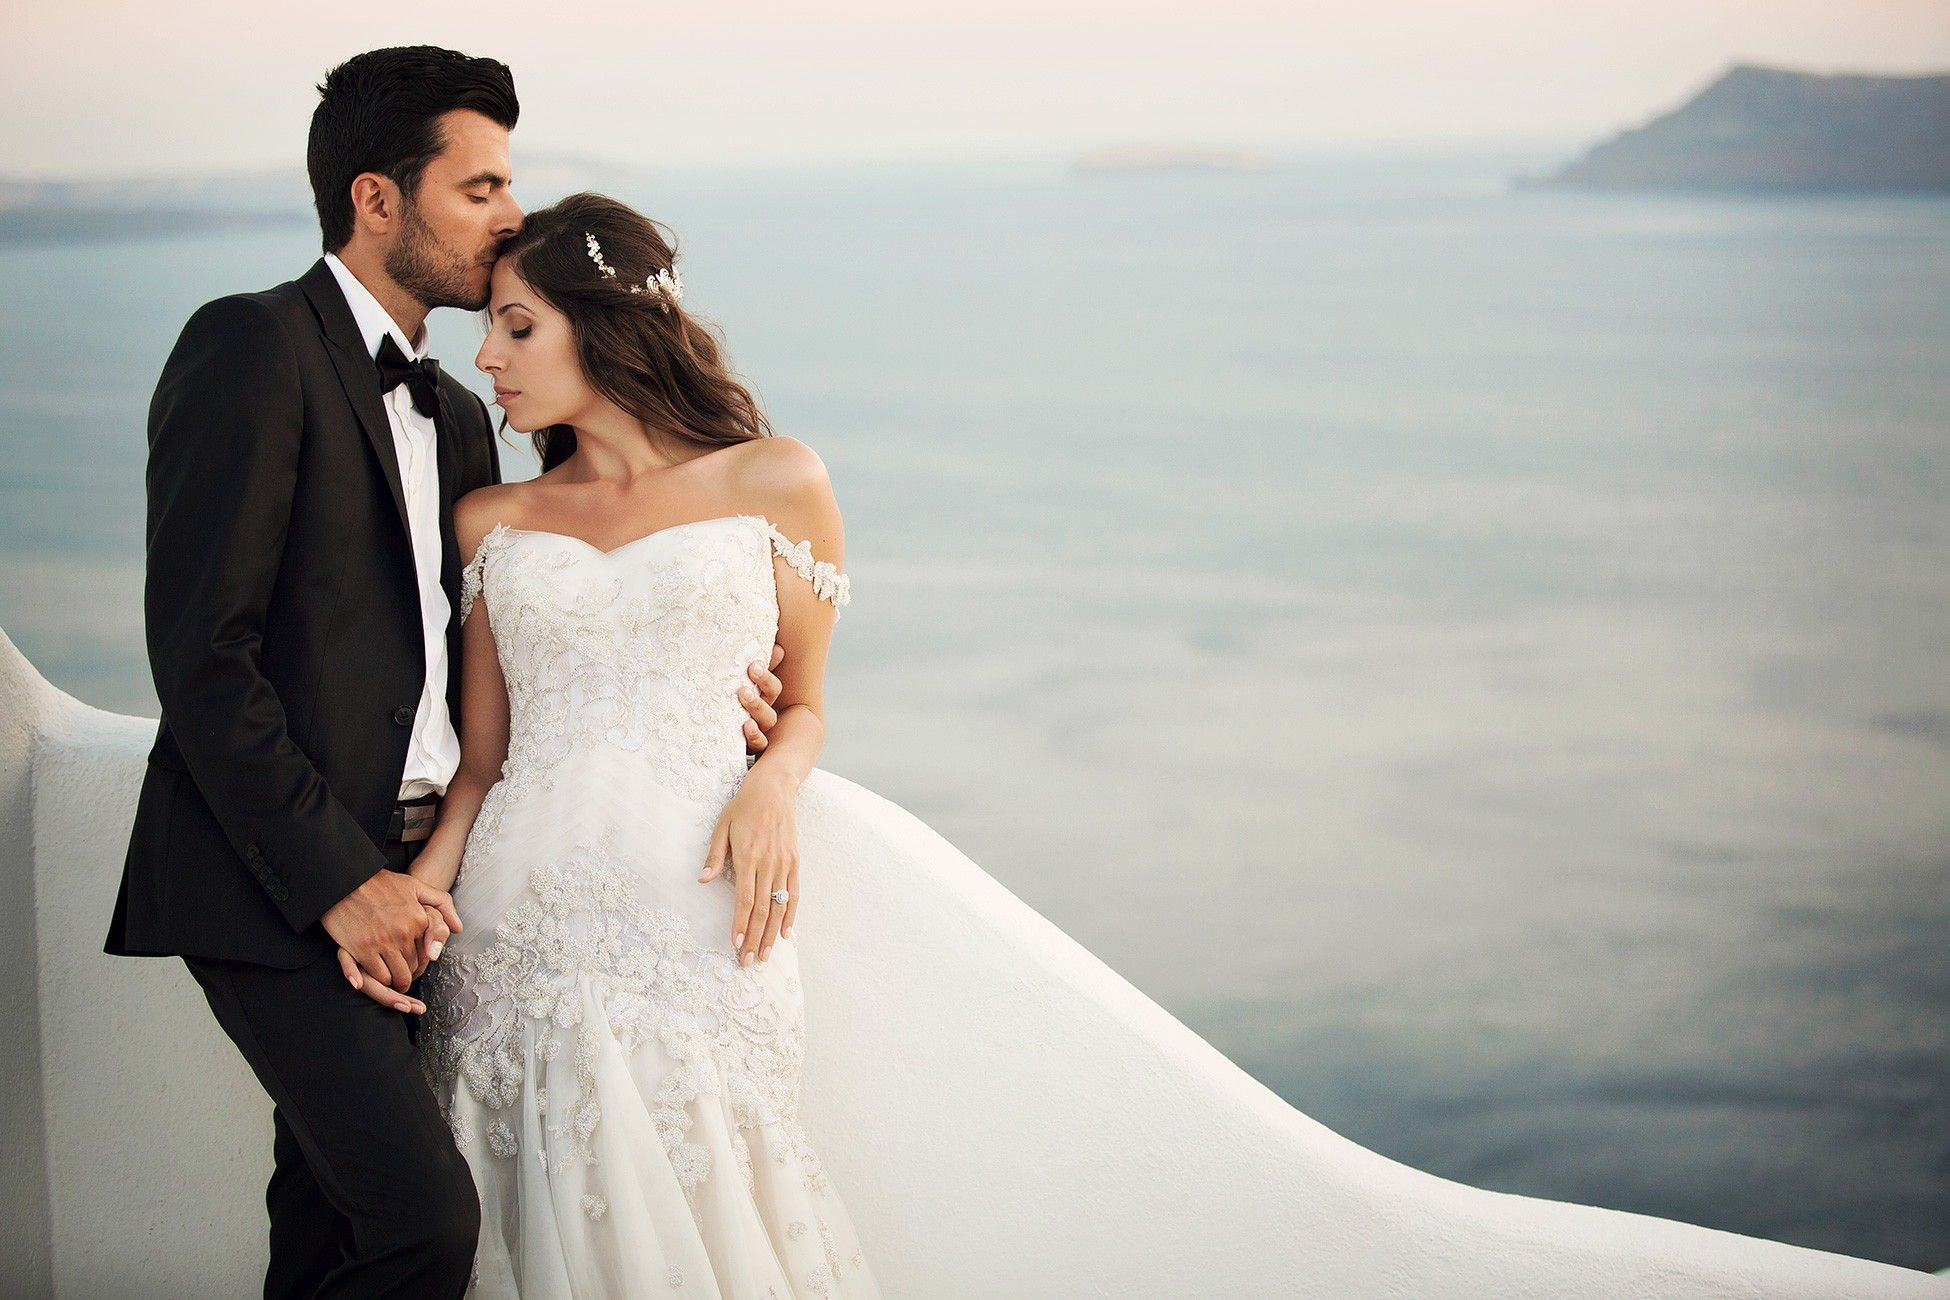 Santorini wedding Jonathan Thrasher destination wedding photography | Jonathan Thrasher Photography weddings | Pinterest | Destination weddings, ...